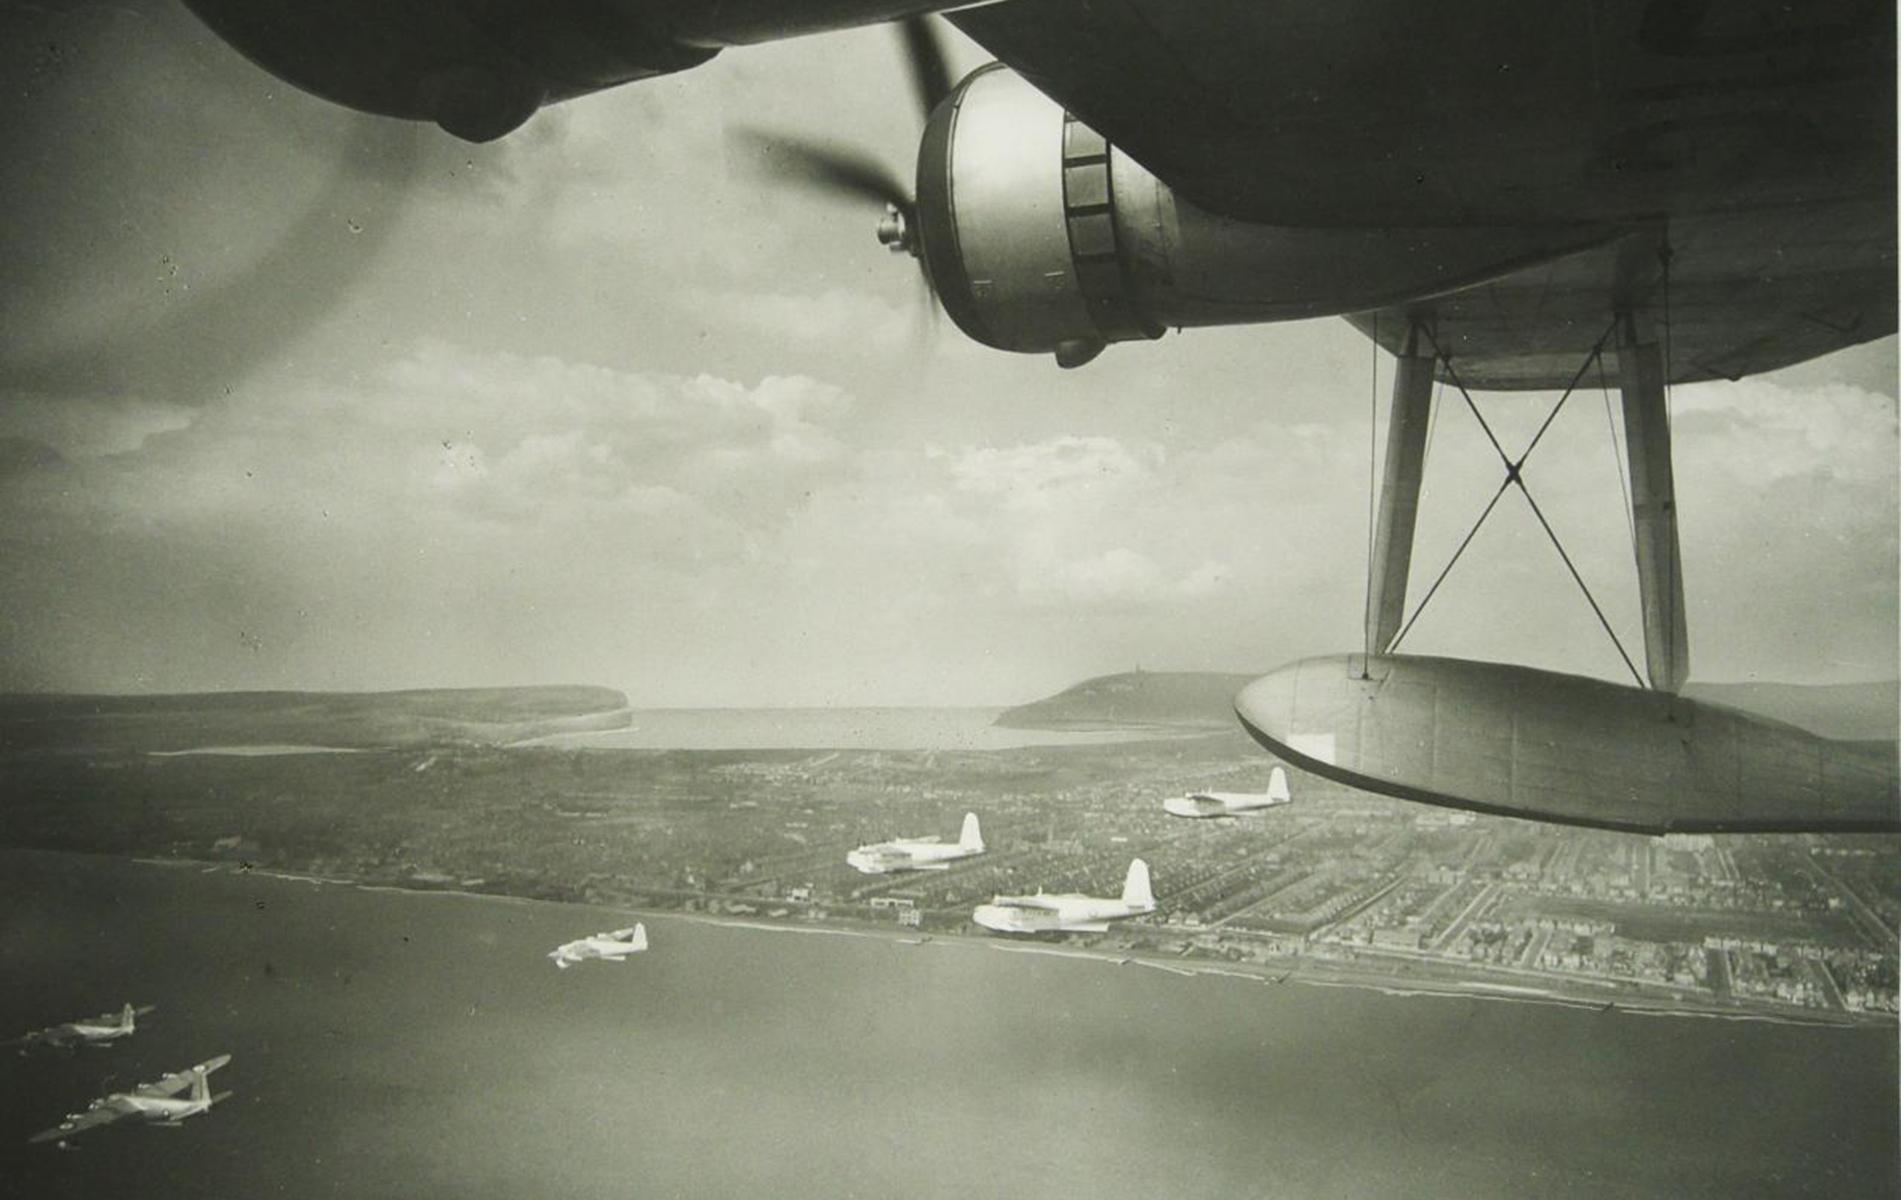 World War II and the MK Ultra Program